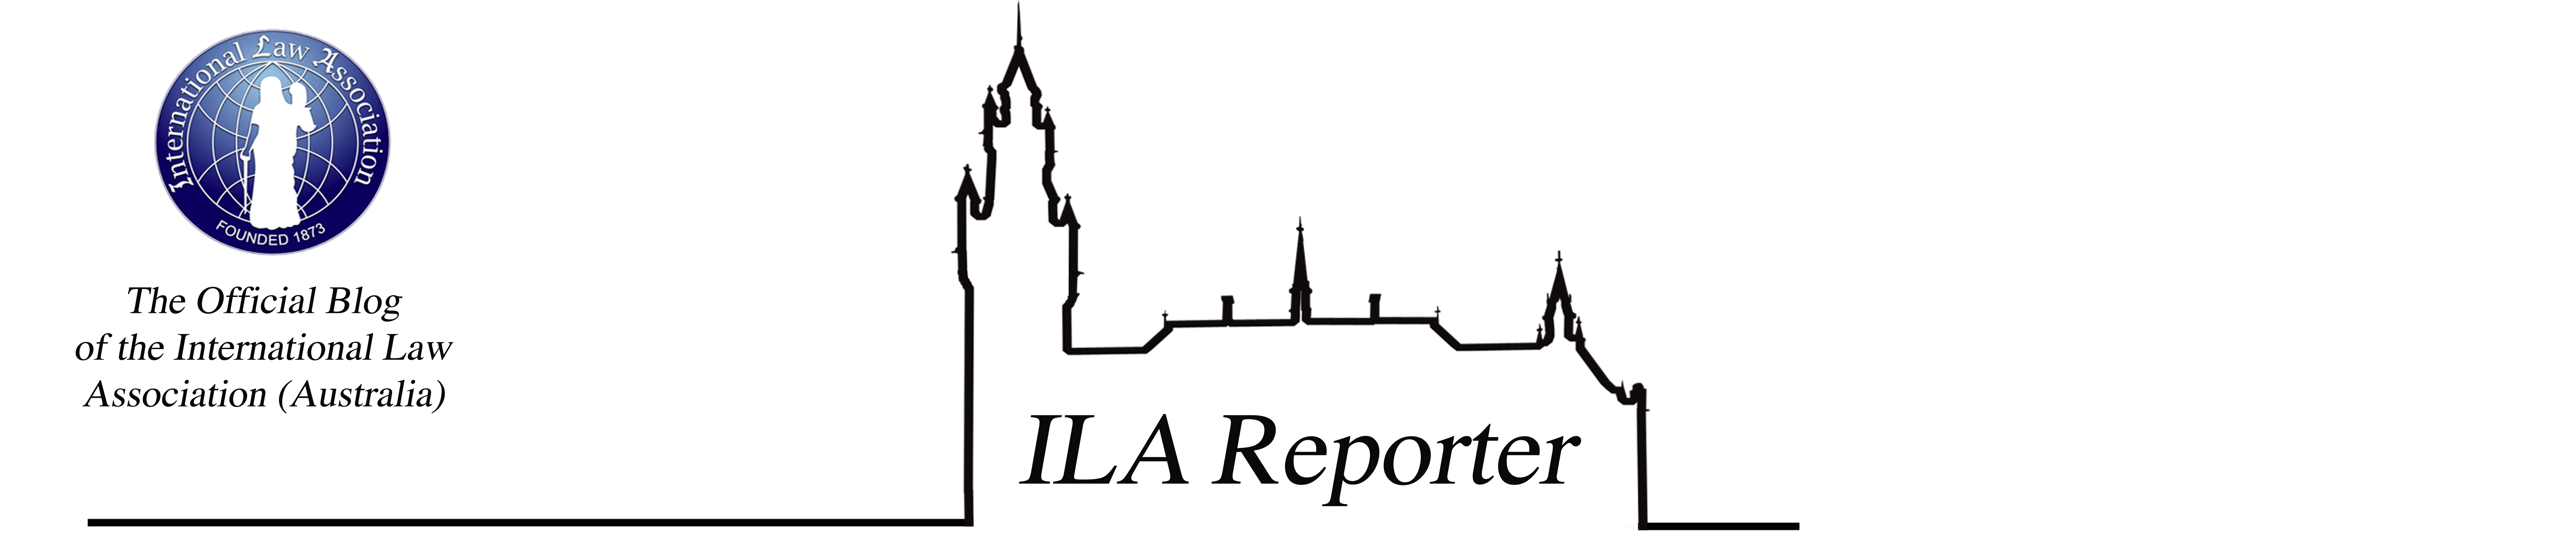 ILA Reporter